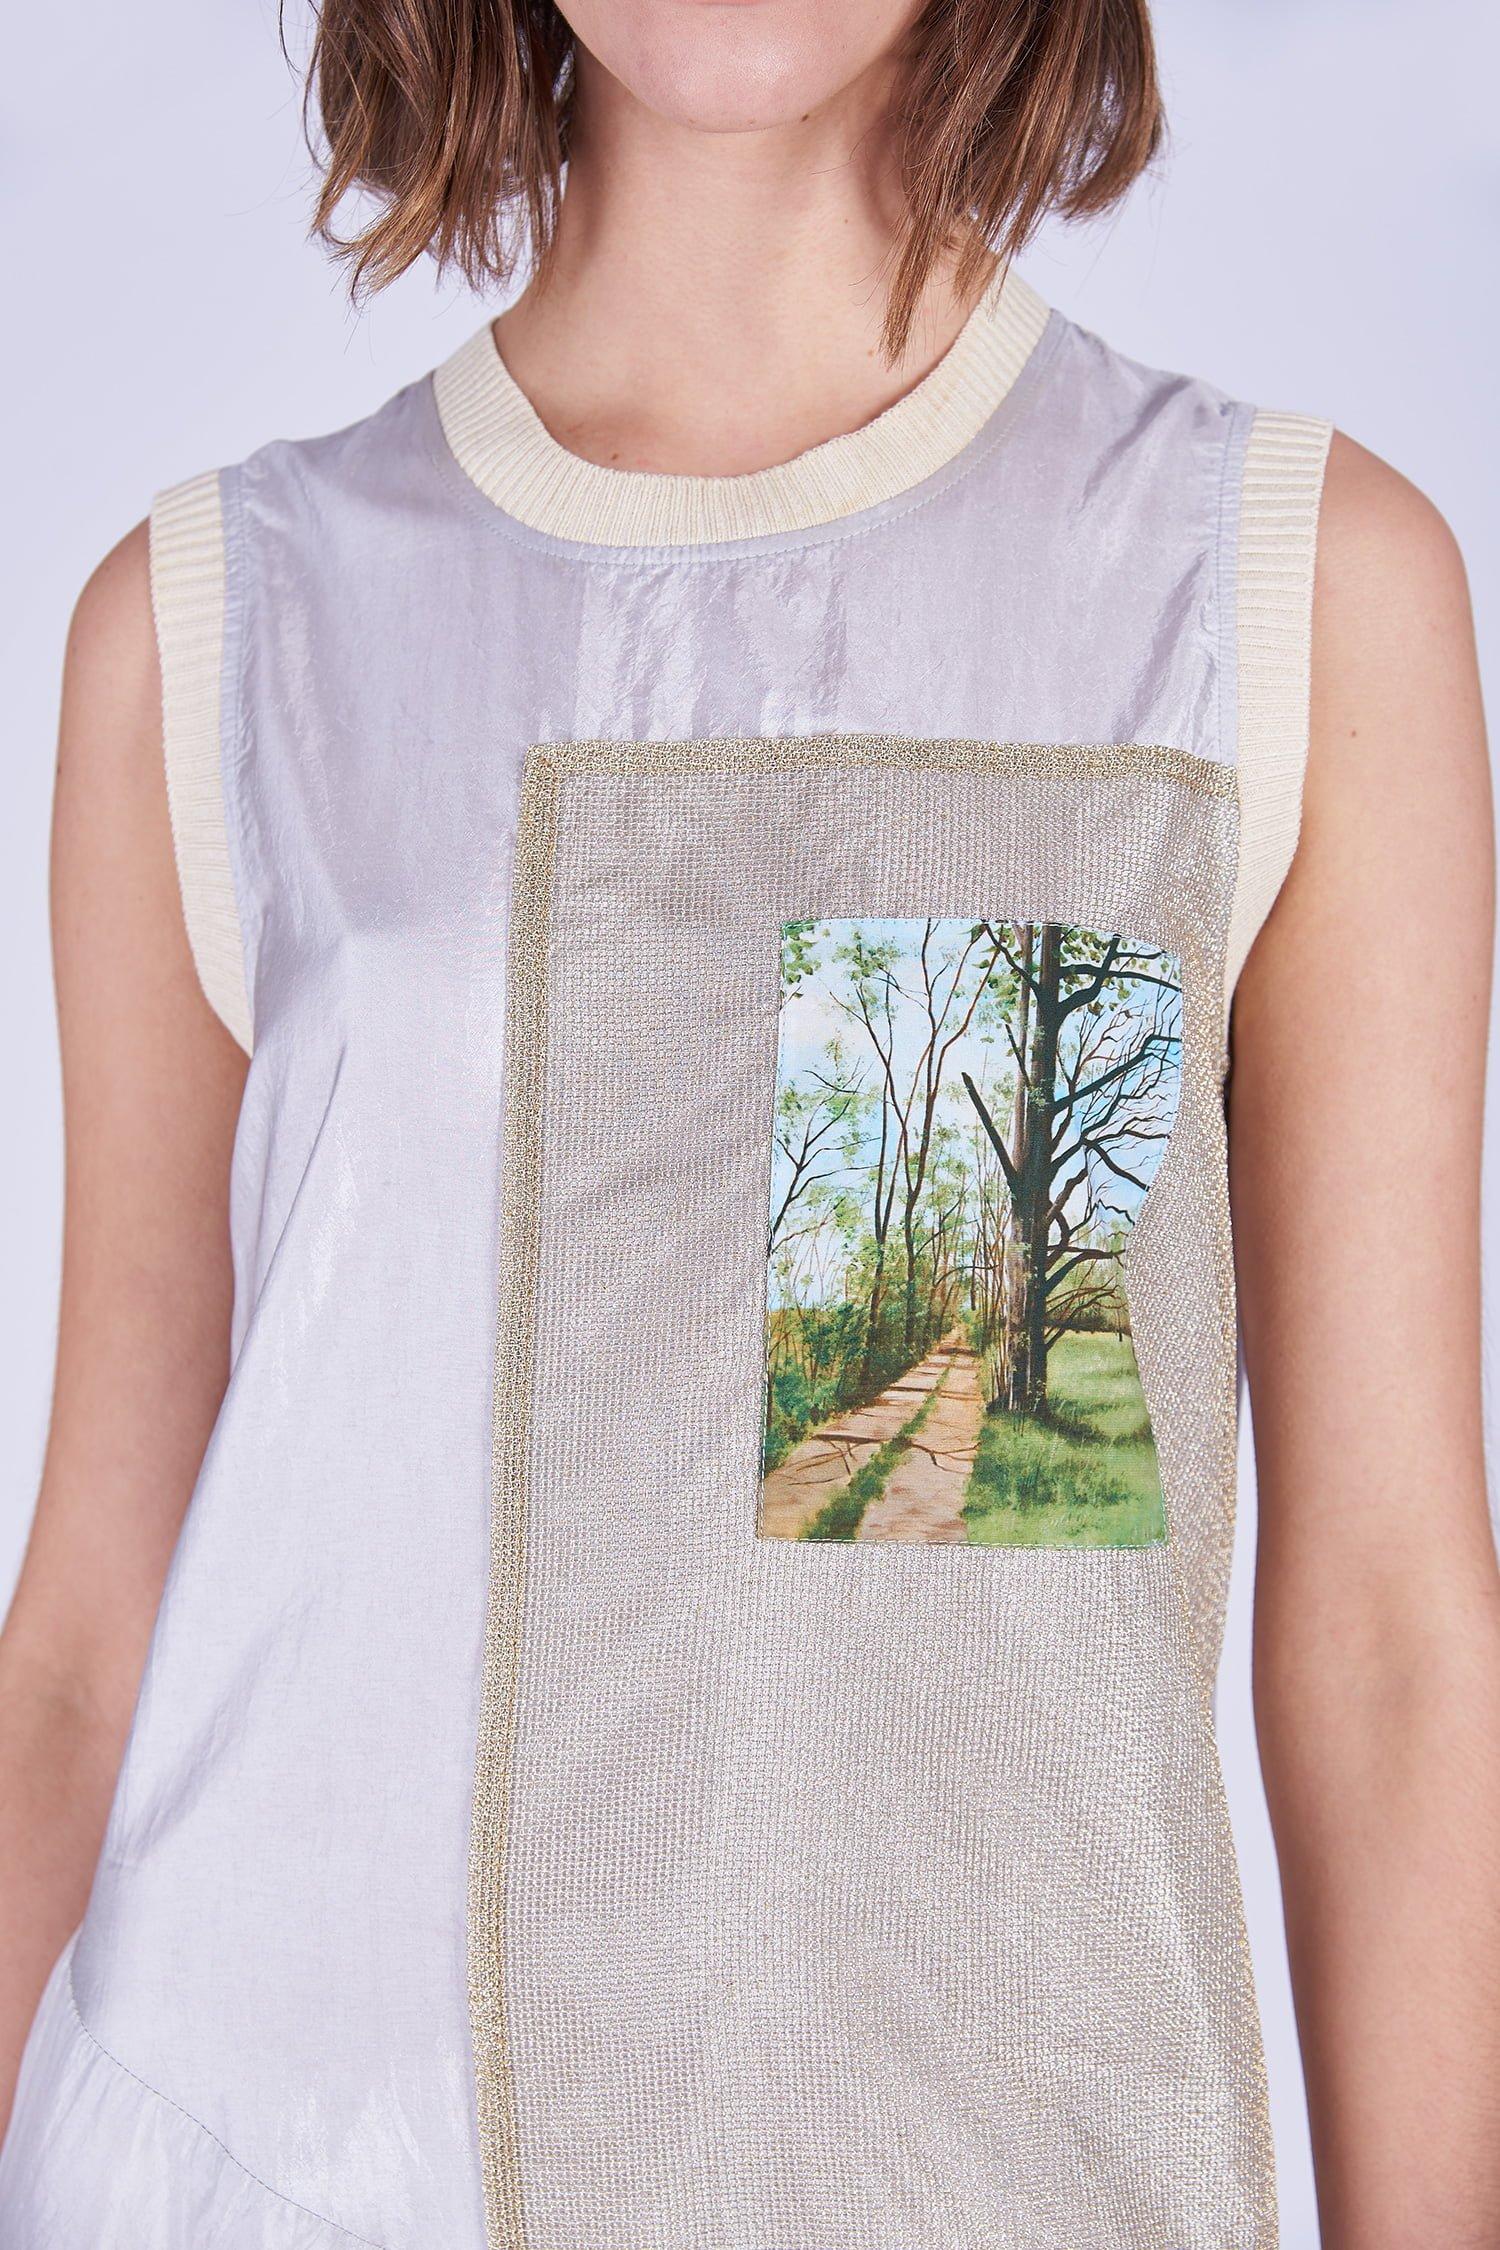 Acephala Ss2020 Sleeveless Summer Dress Letnia Sukienka Detail Top